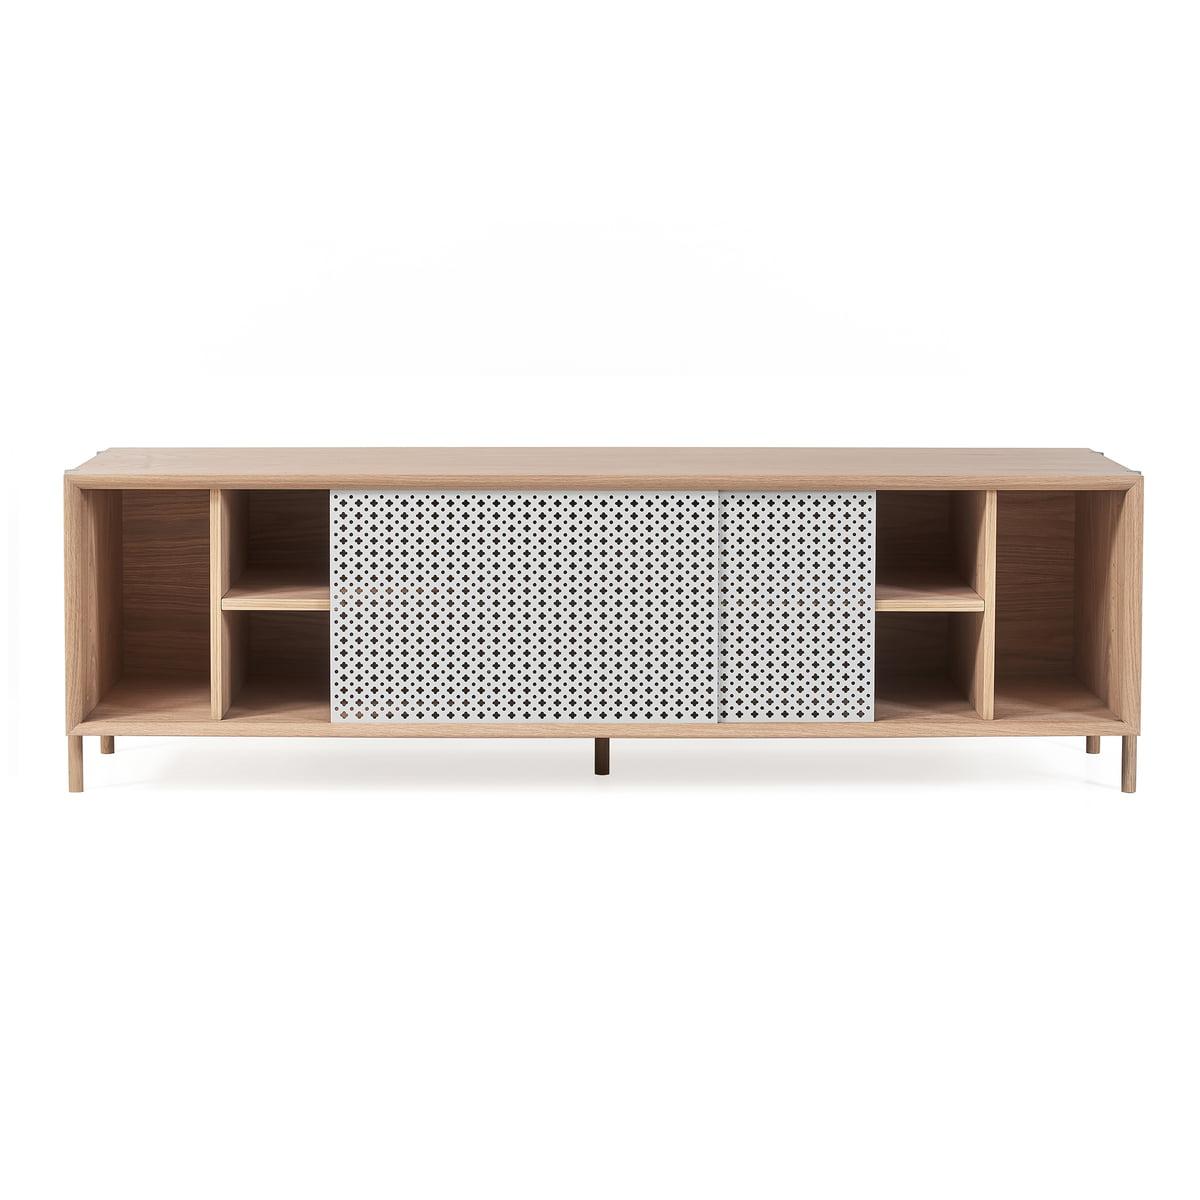 gabin sideboard cm von hart connox. Black Bedroom Furniture Sets. Home Design Ideas